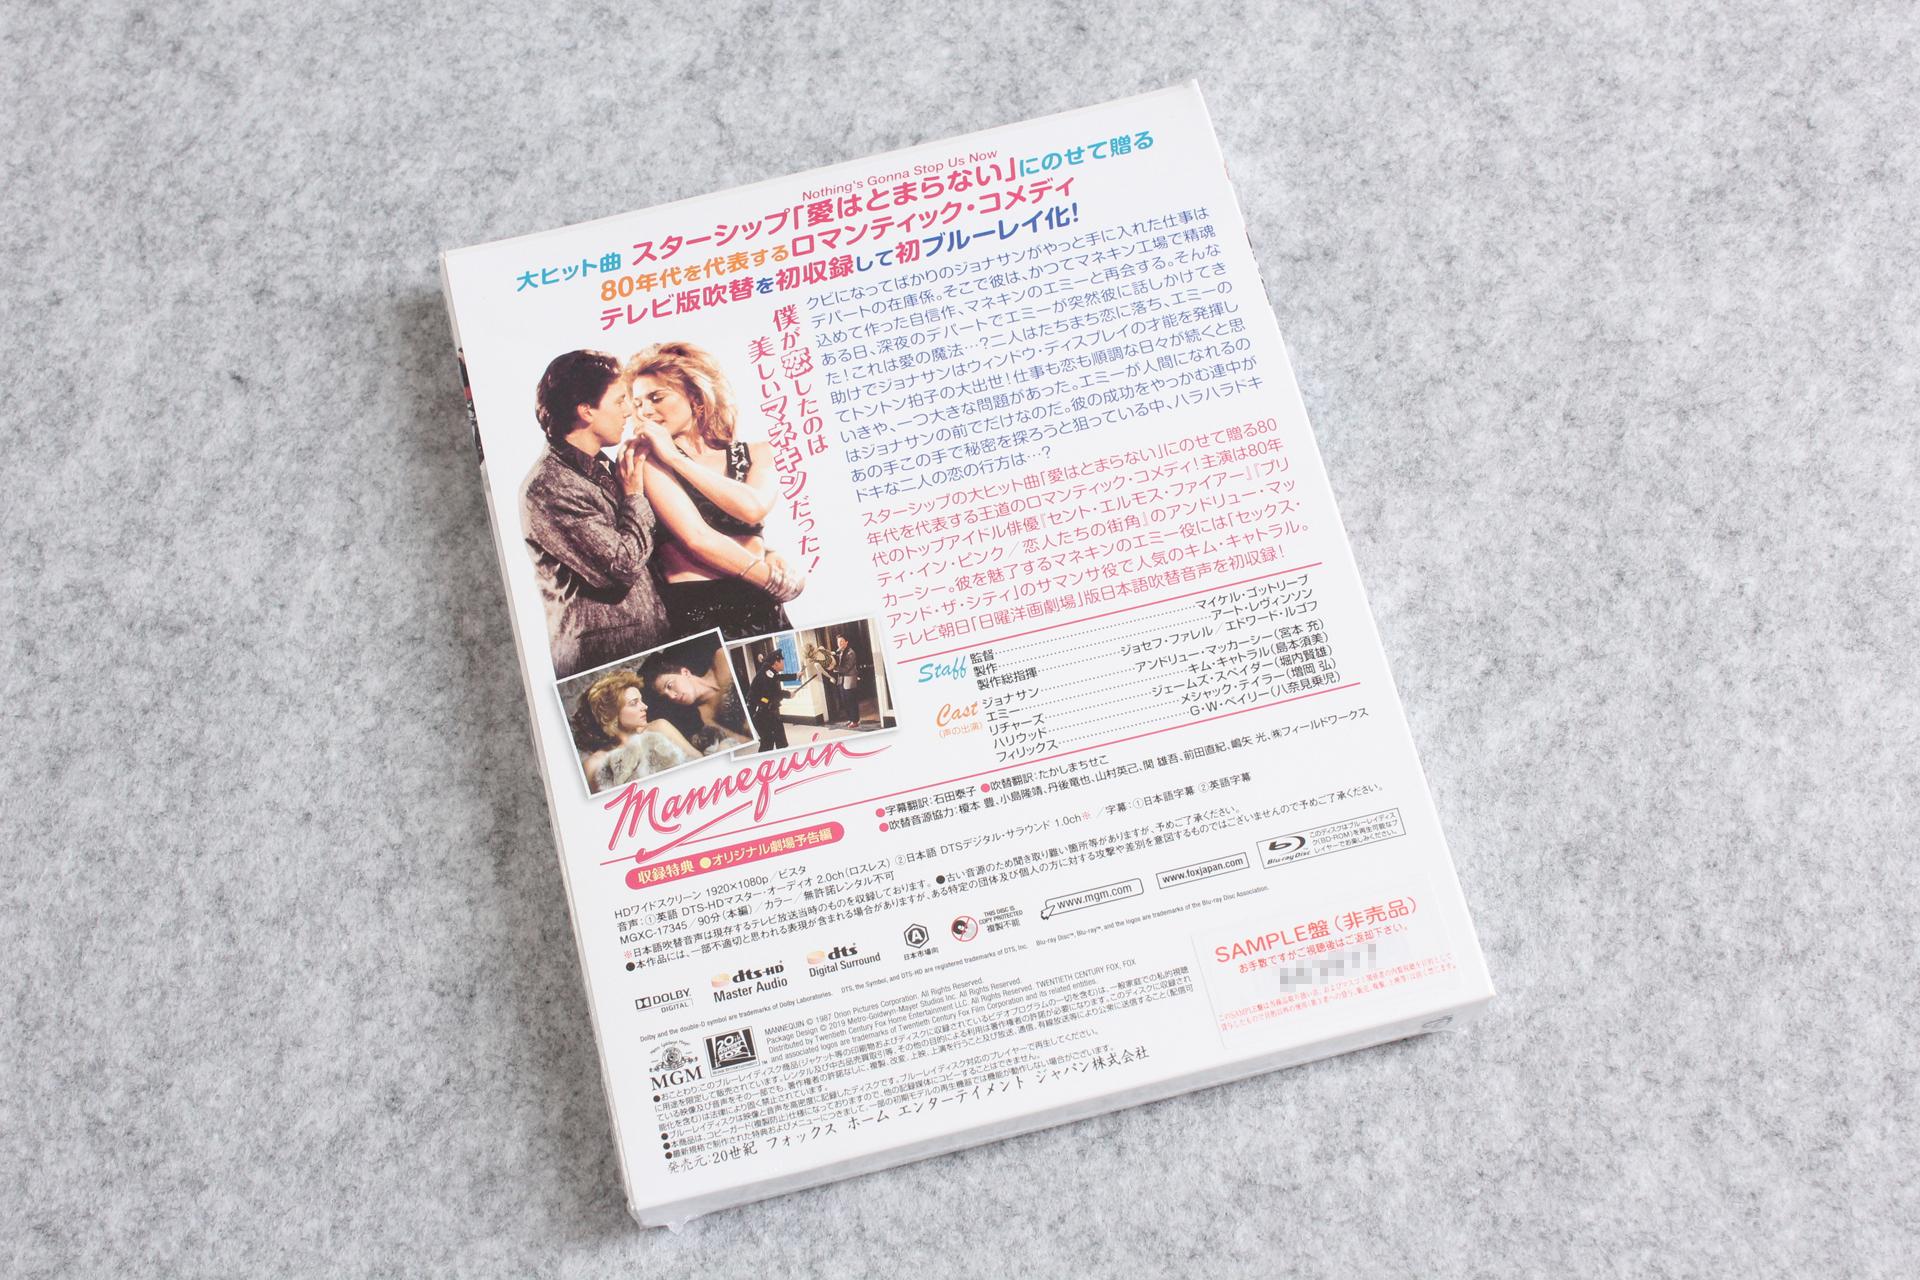 2019-04-25-MANNEQUIN_BD-2.JPG